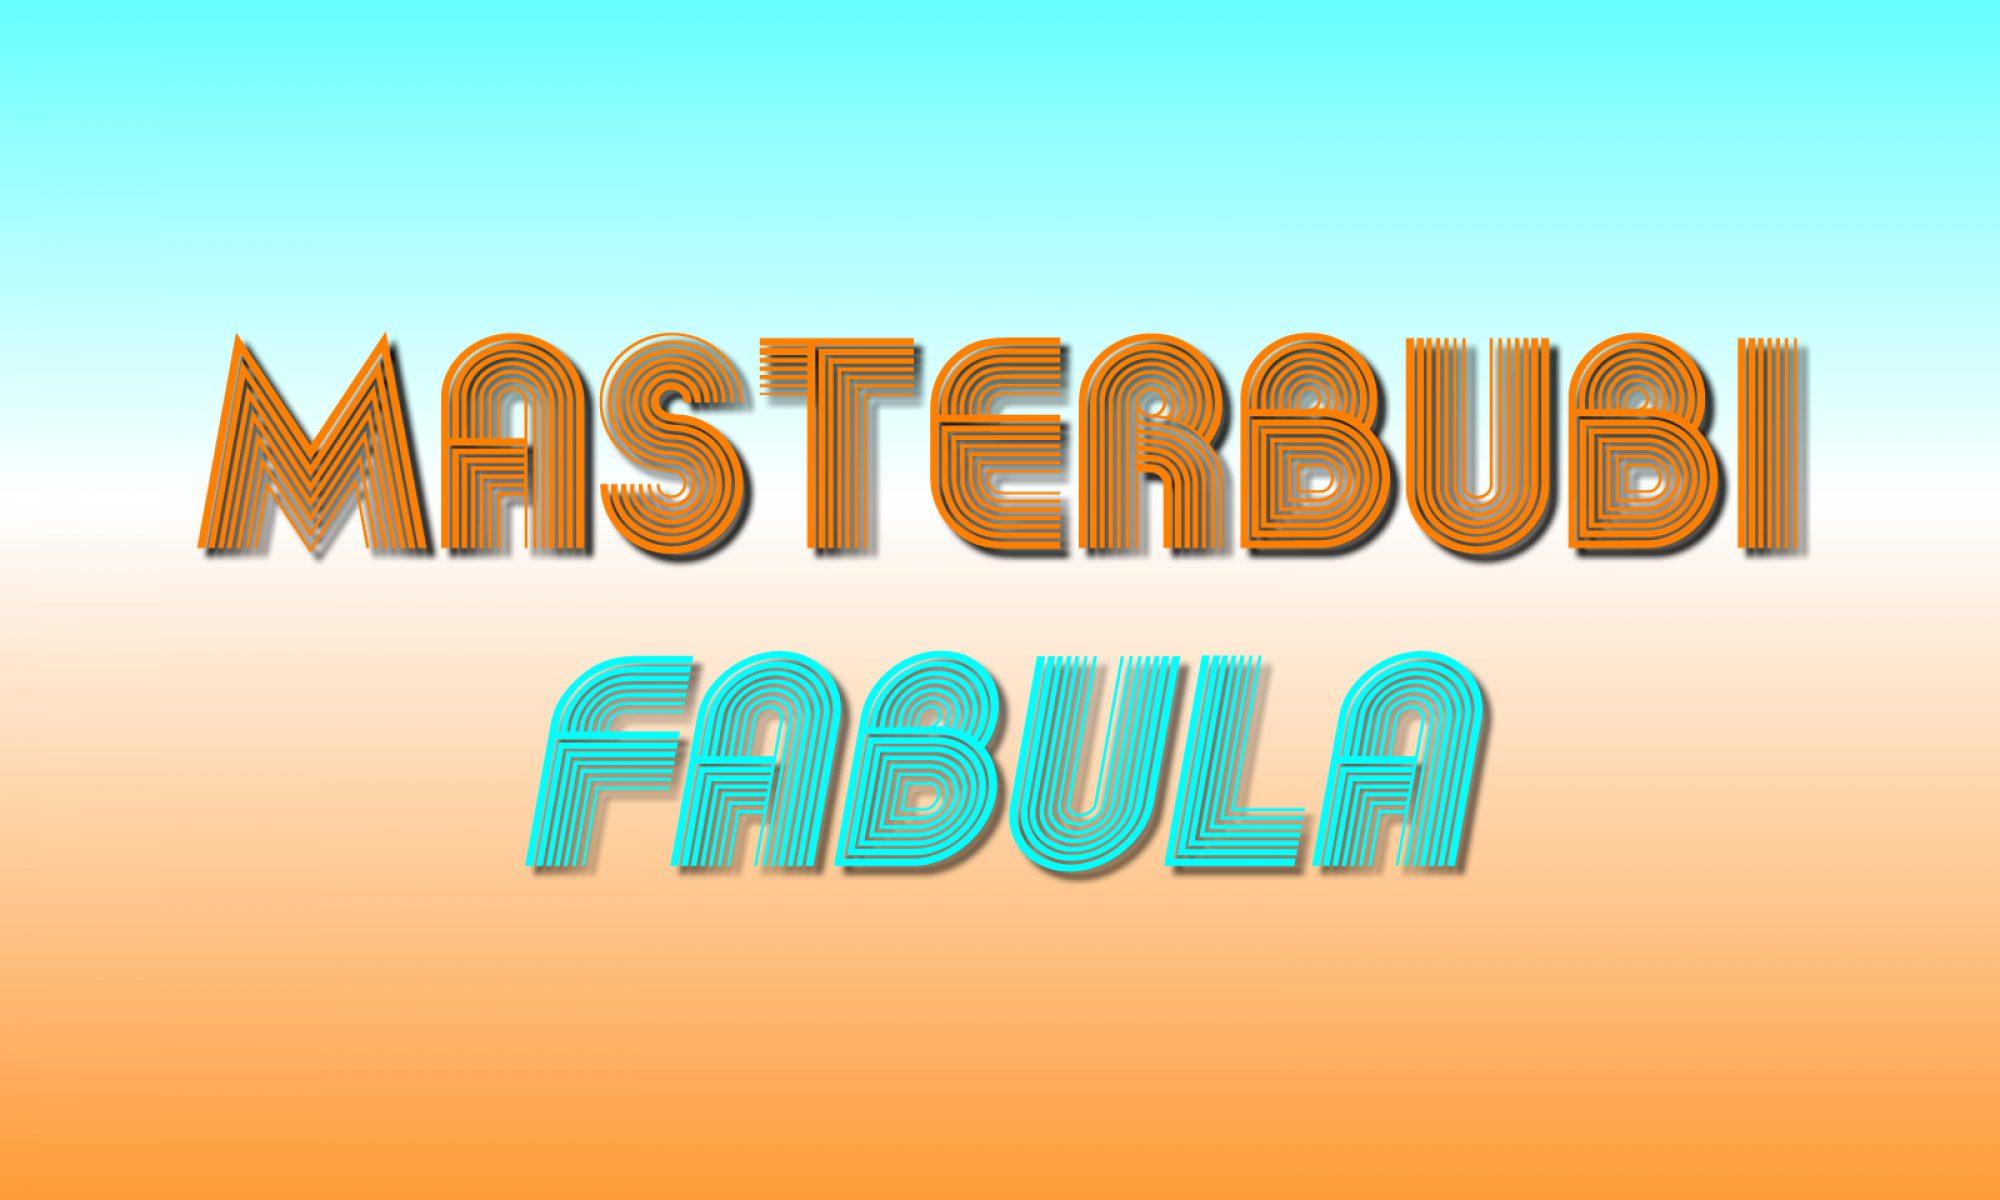 MASTERBUBI